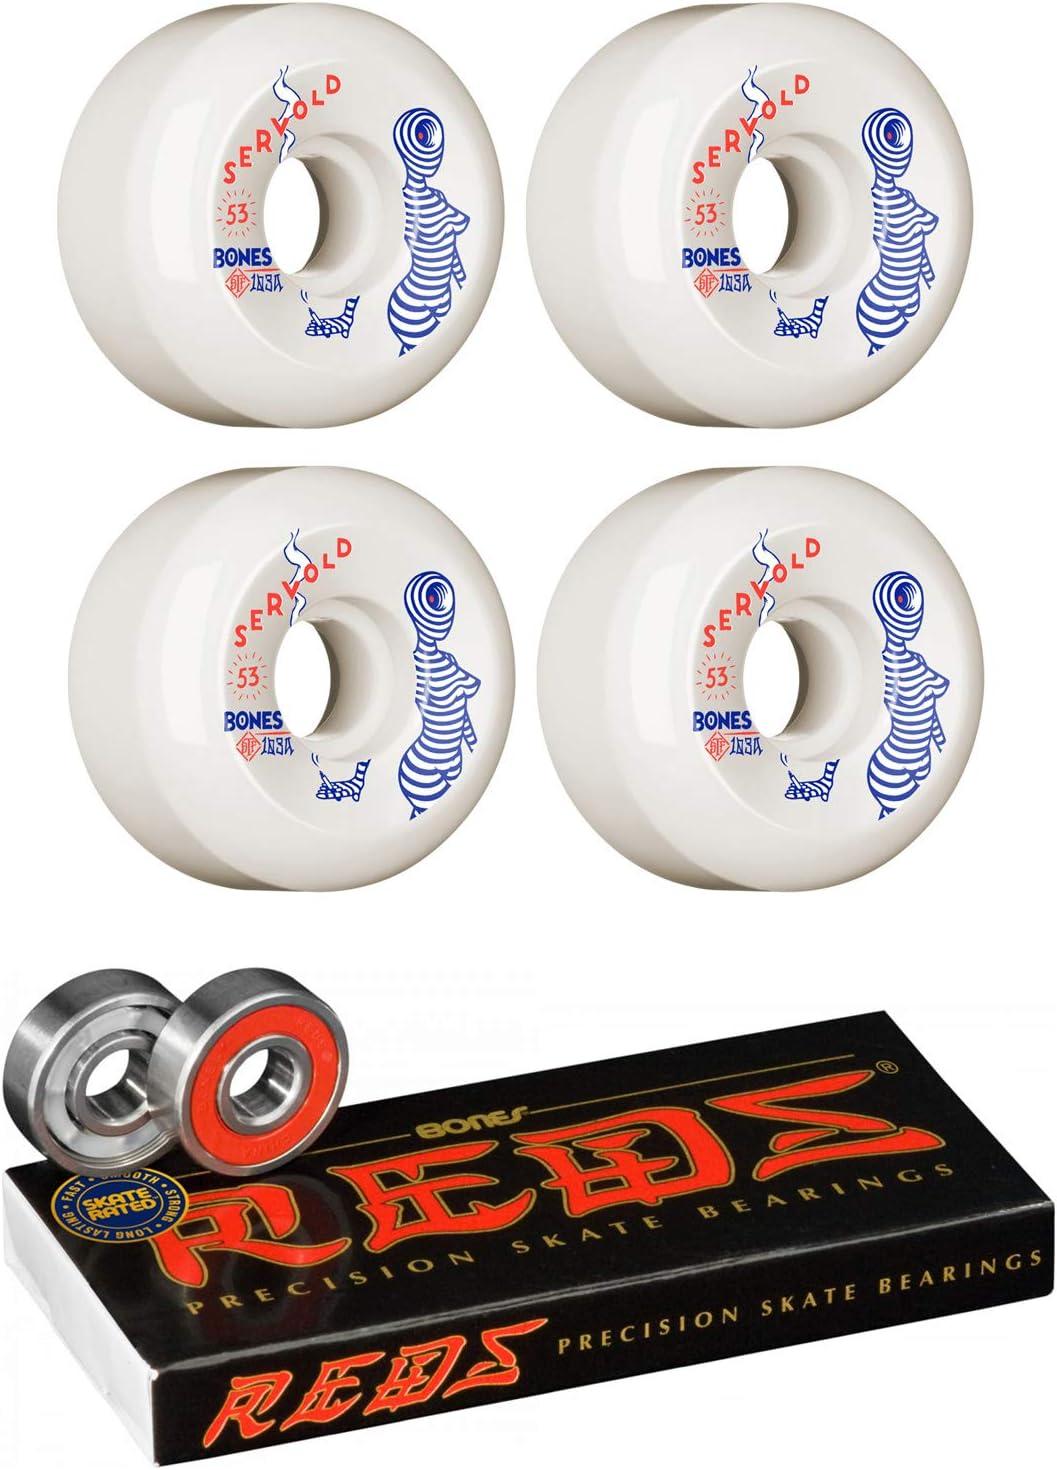 Bones Skateboard Wheels 53mm Servold Mindseye V5 103A STF with Bones Reds Bearings